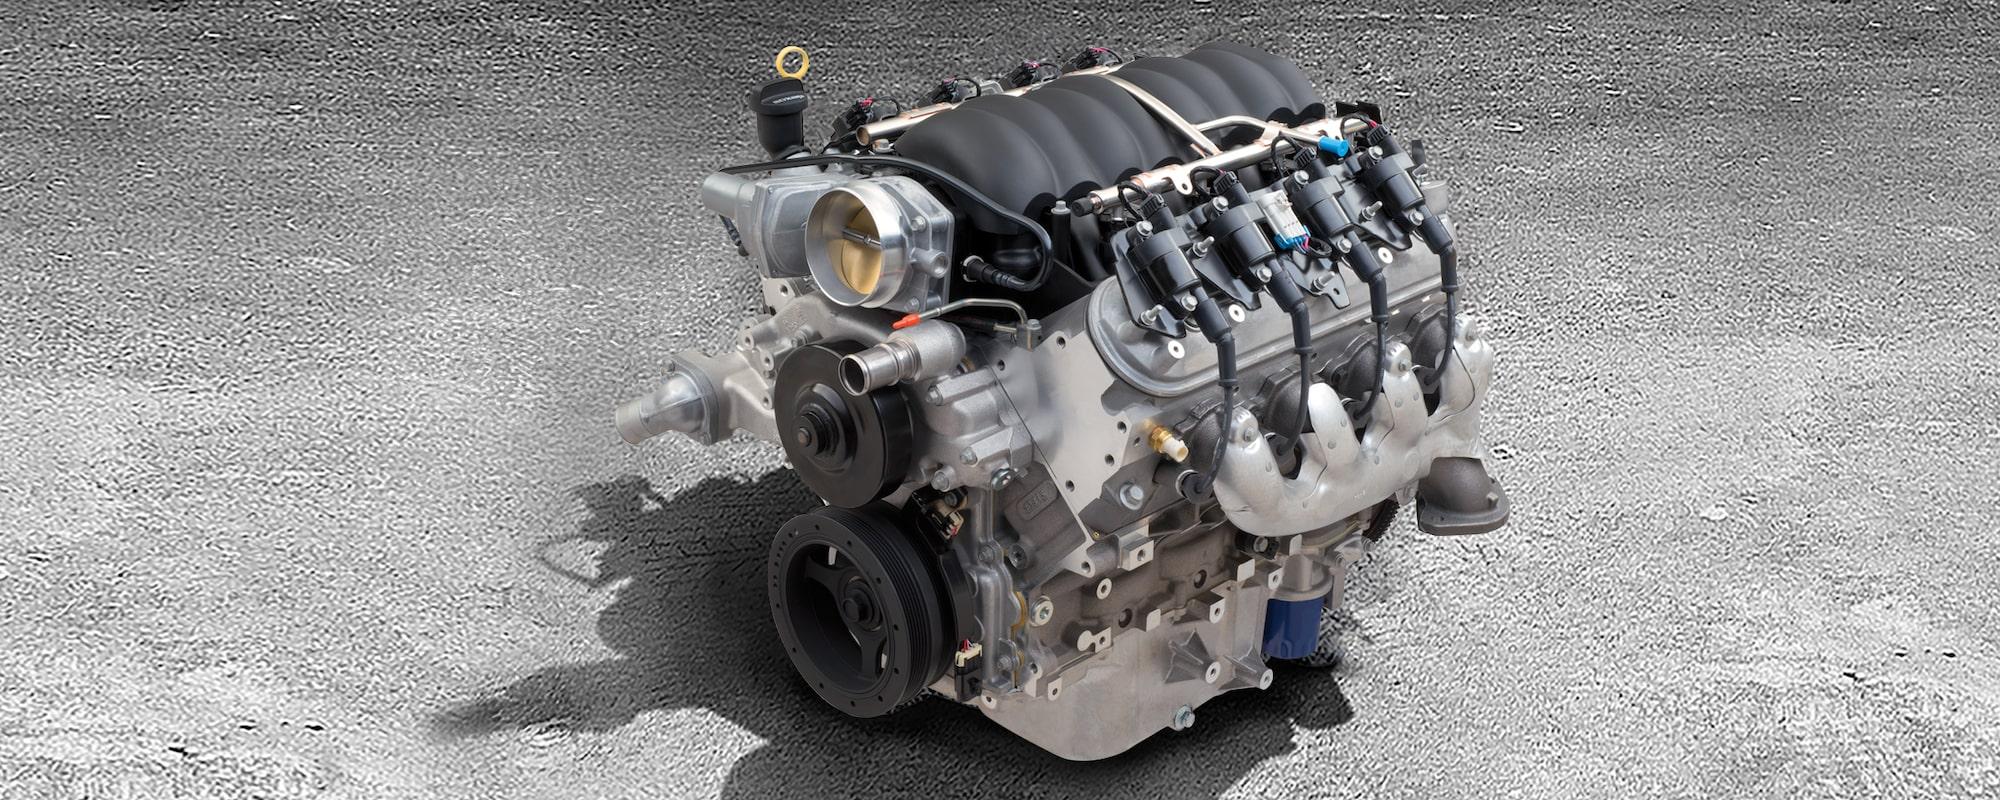 ls3 crate engine race engine chevrolet performance rh chevrolet com